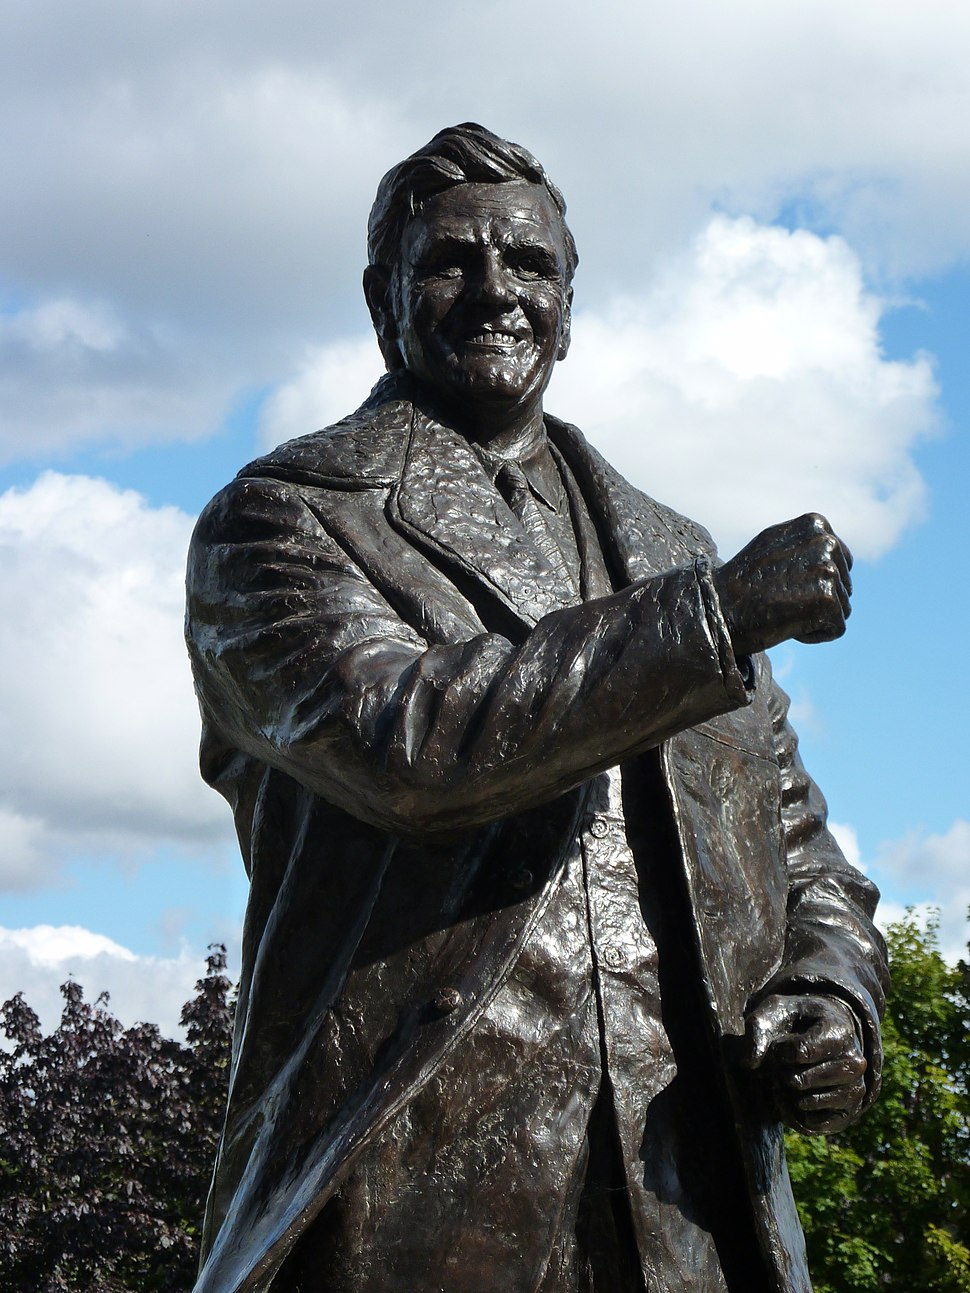 Don Revie statue, Elland Road